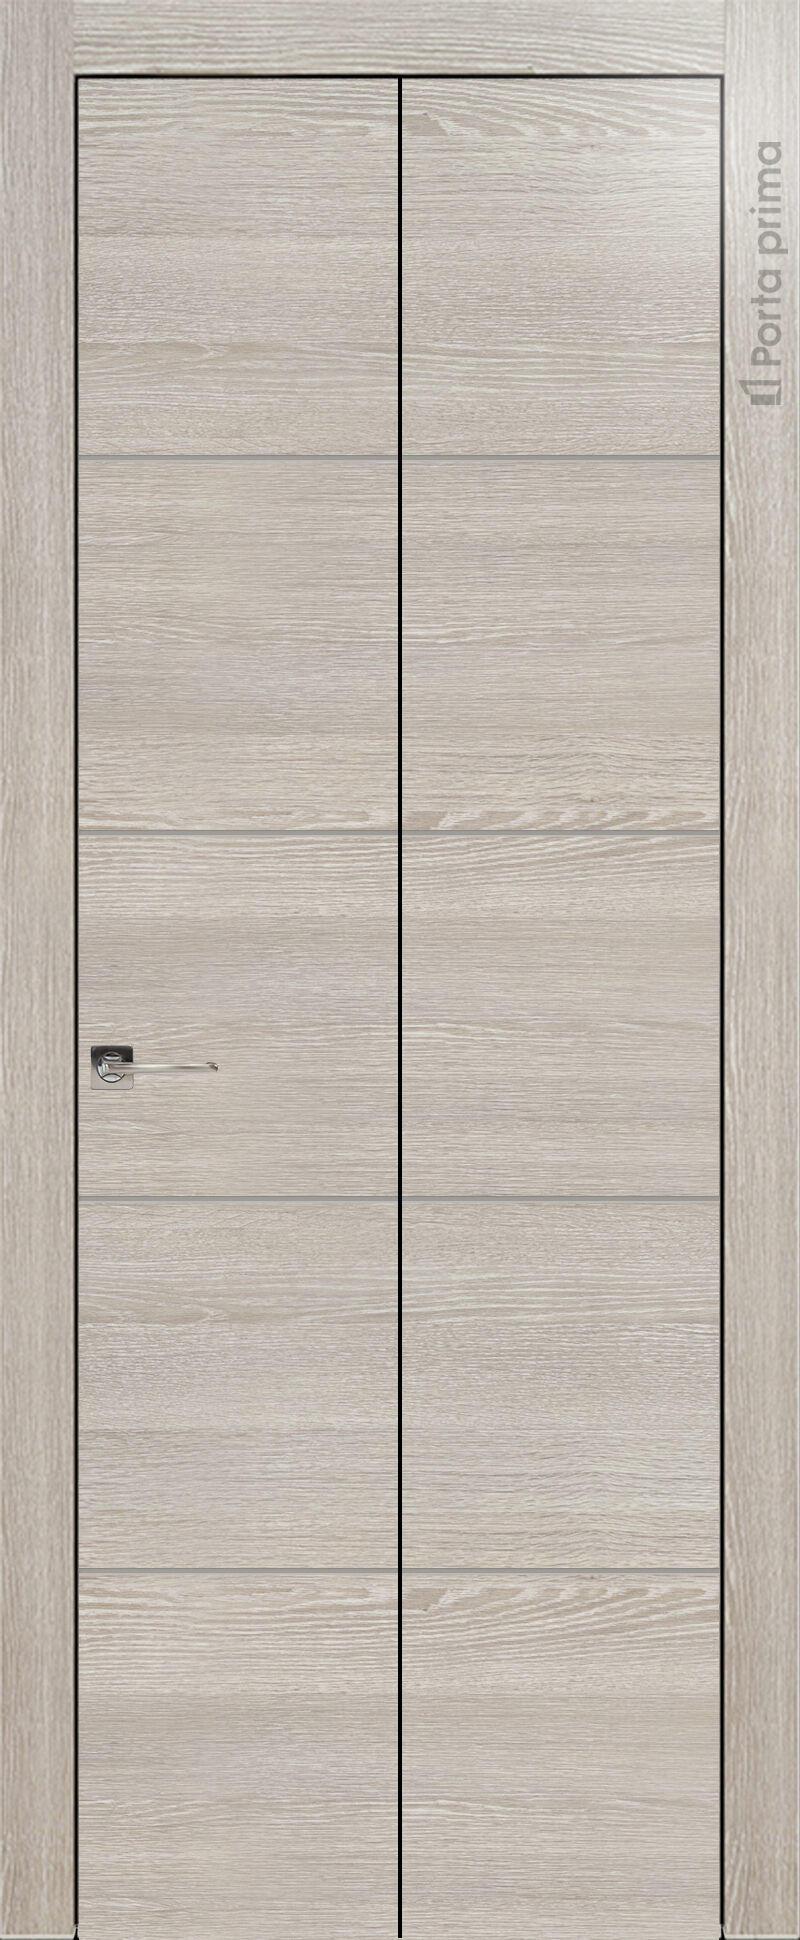 Tivoli Д-2 Книжка цвет - Серый дуб Без стекла (ДГ)